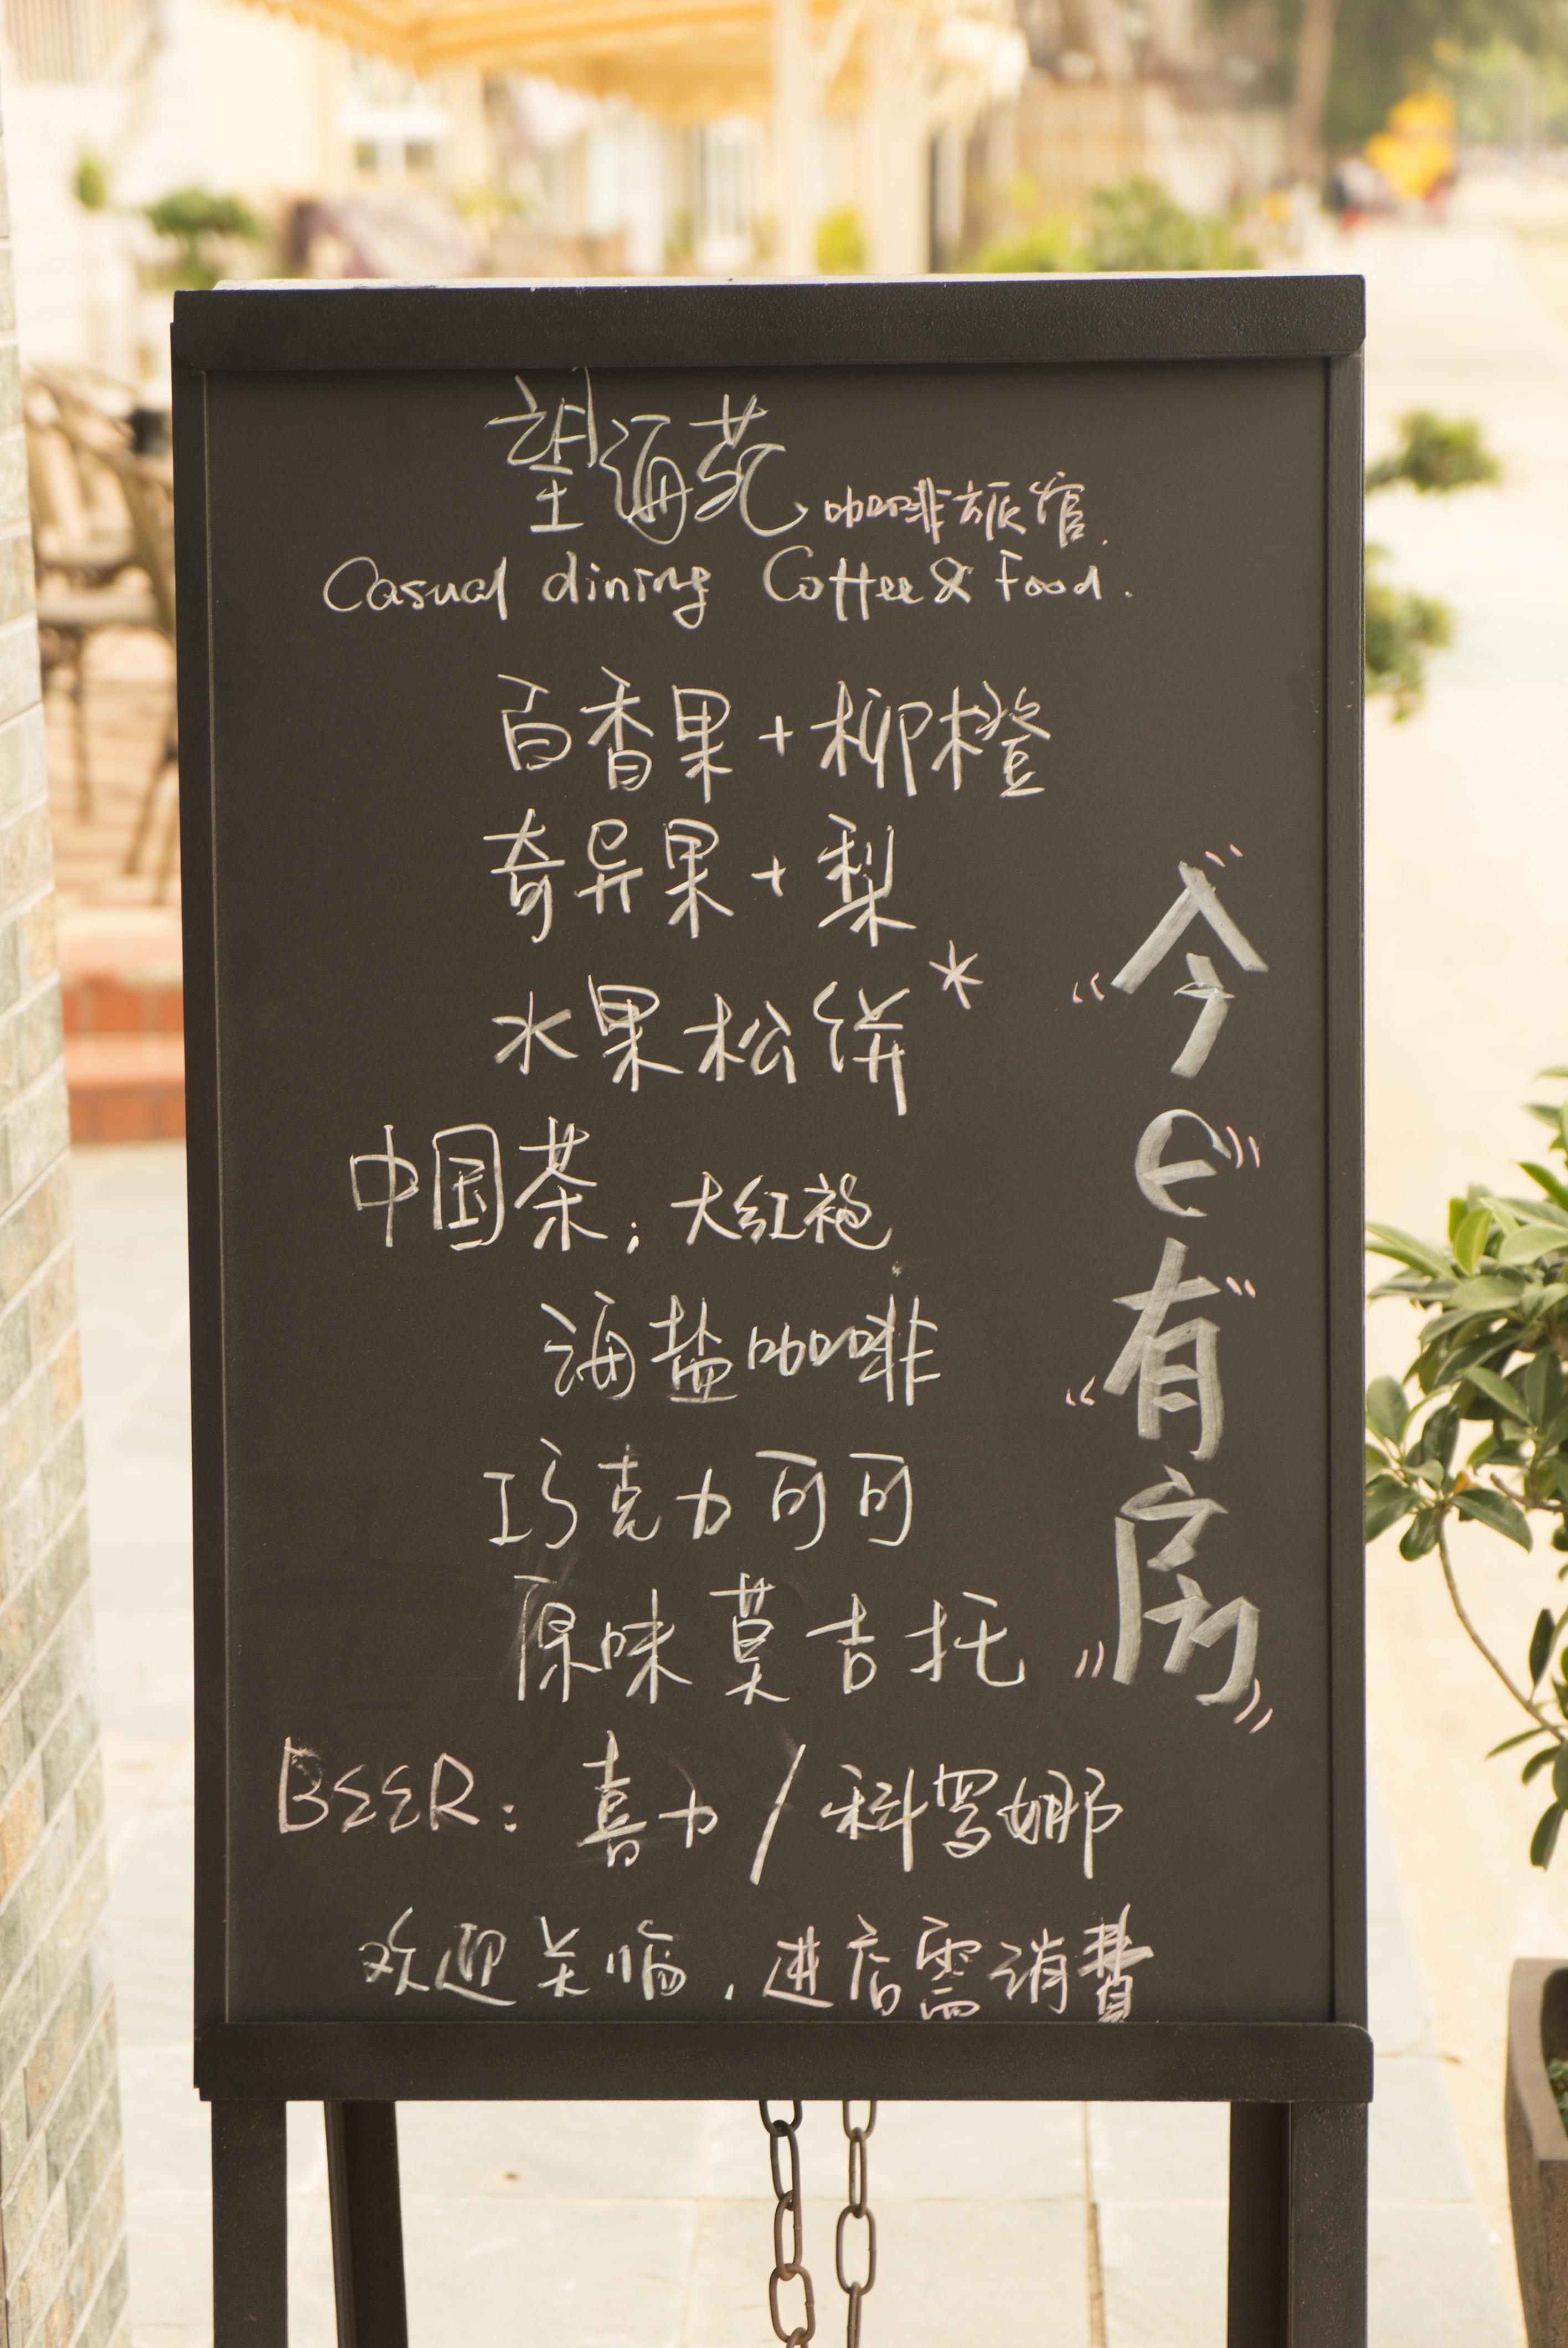 Wang Hai Yuan Hotel and Café (望海苑)